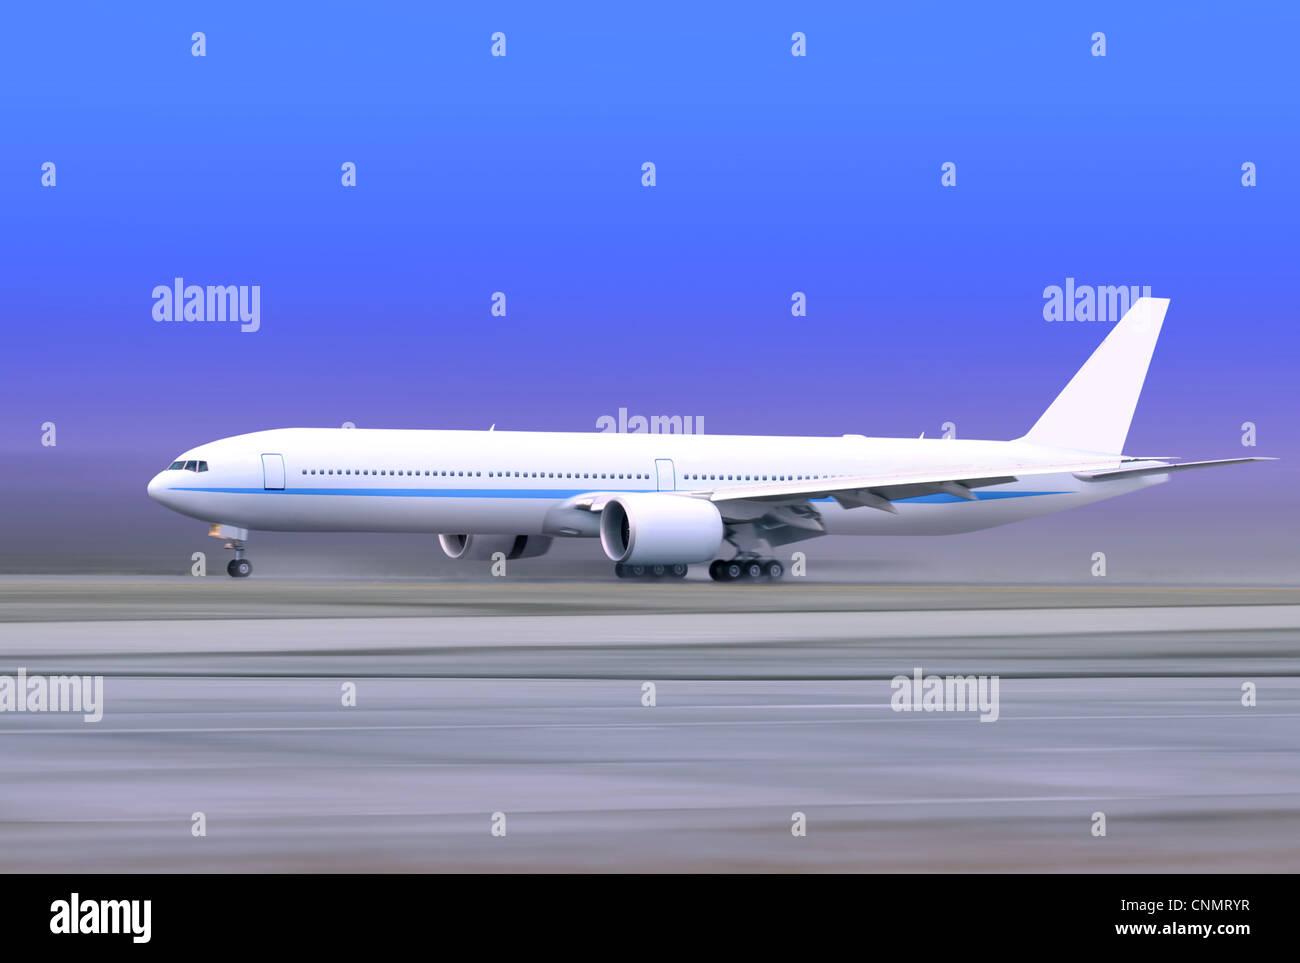 white passenger plane taking off on foggy runway Stock Photo